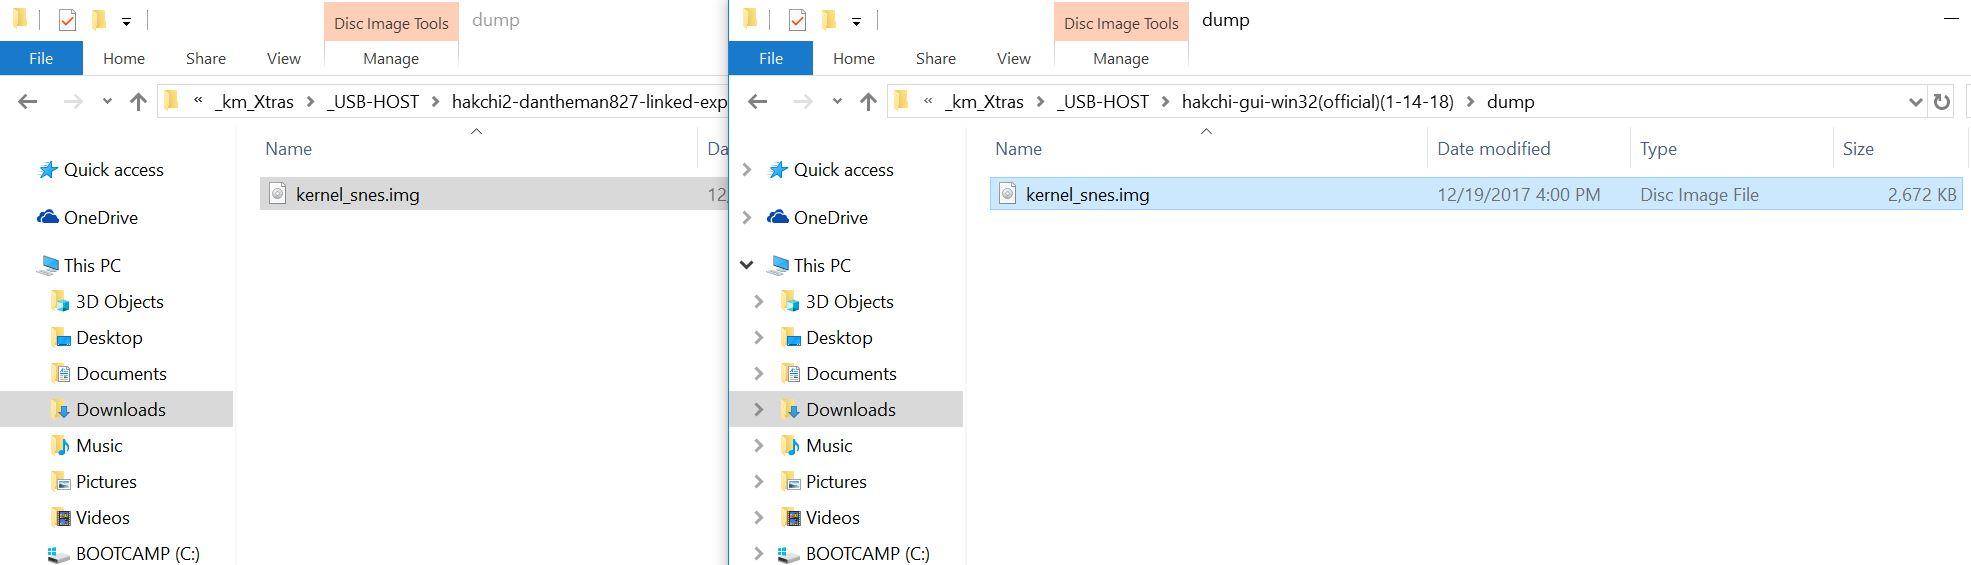 Add More Storage with External USB Hard Drive (USB-Host) Mod